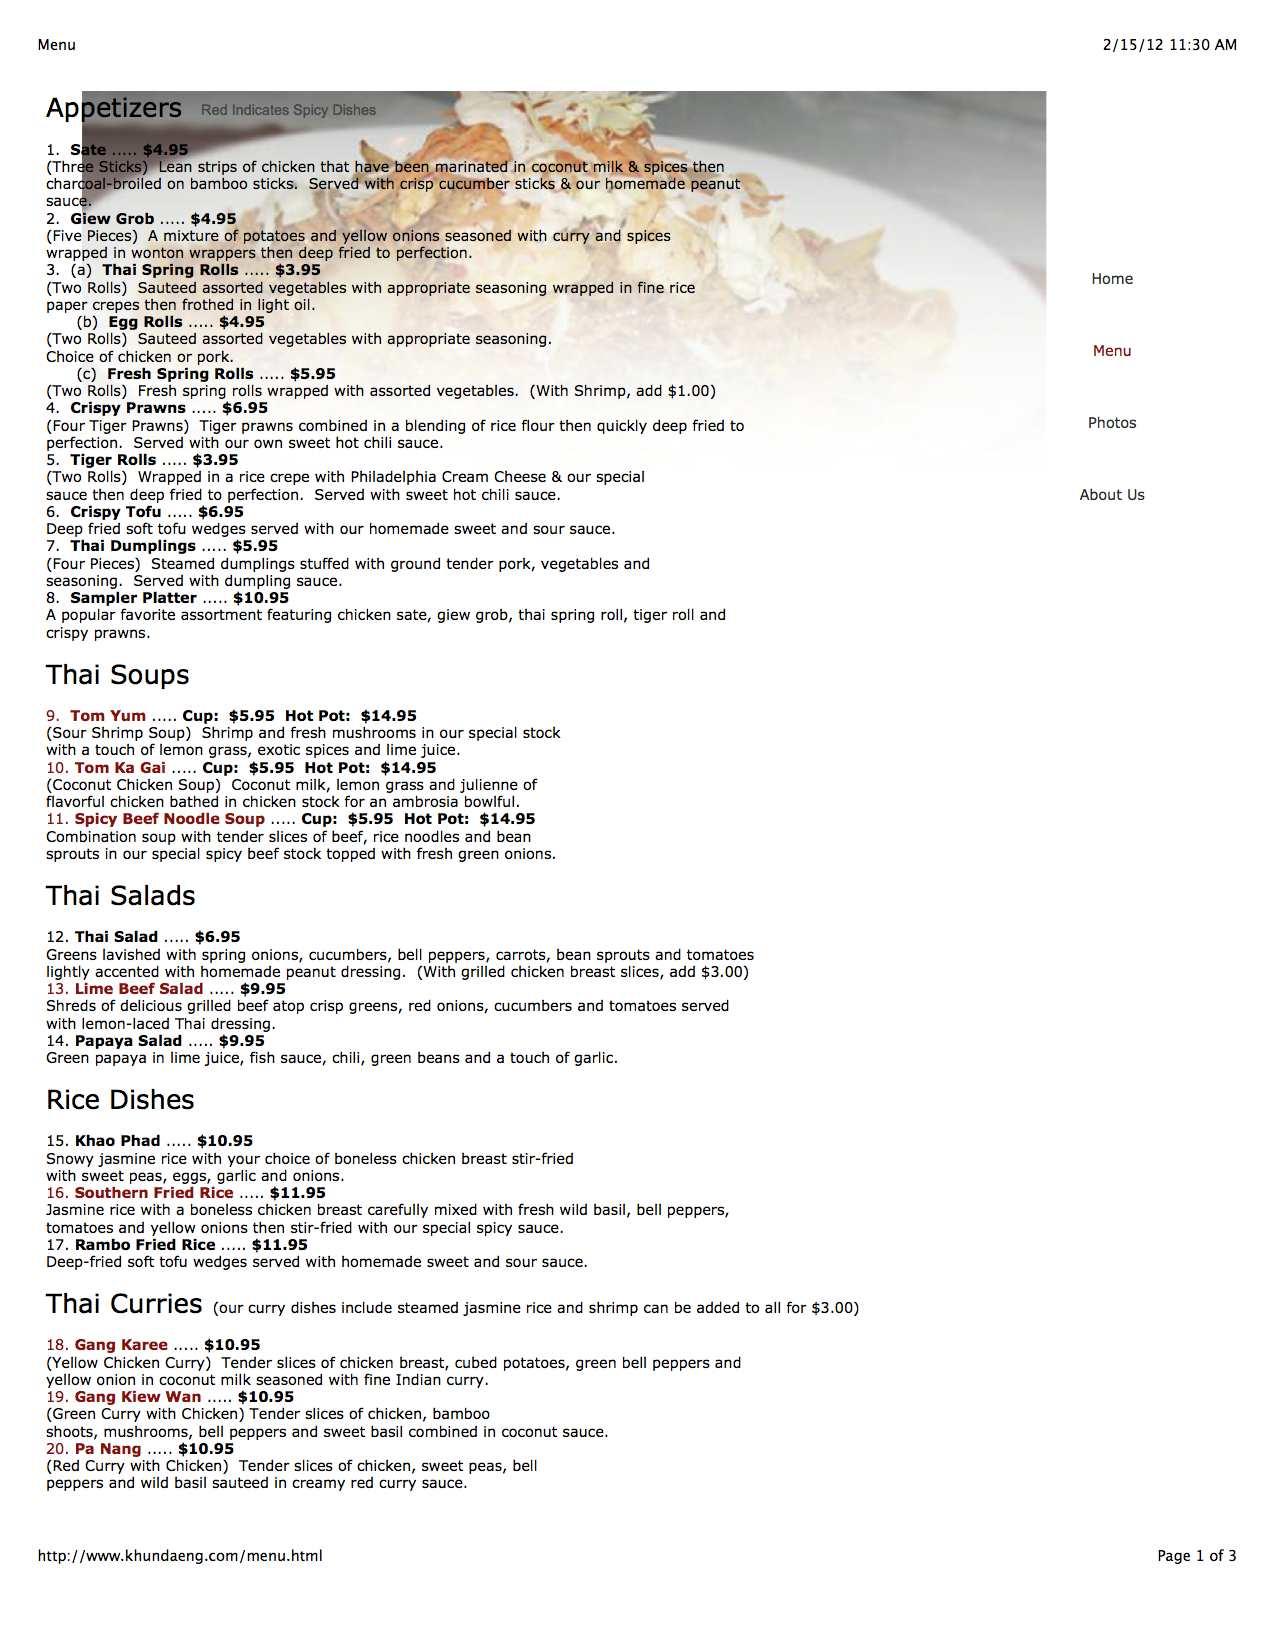 Khun Daeng Thai Kitchen Mishawaka IN Menu Hours Details